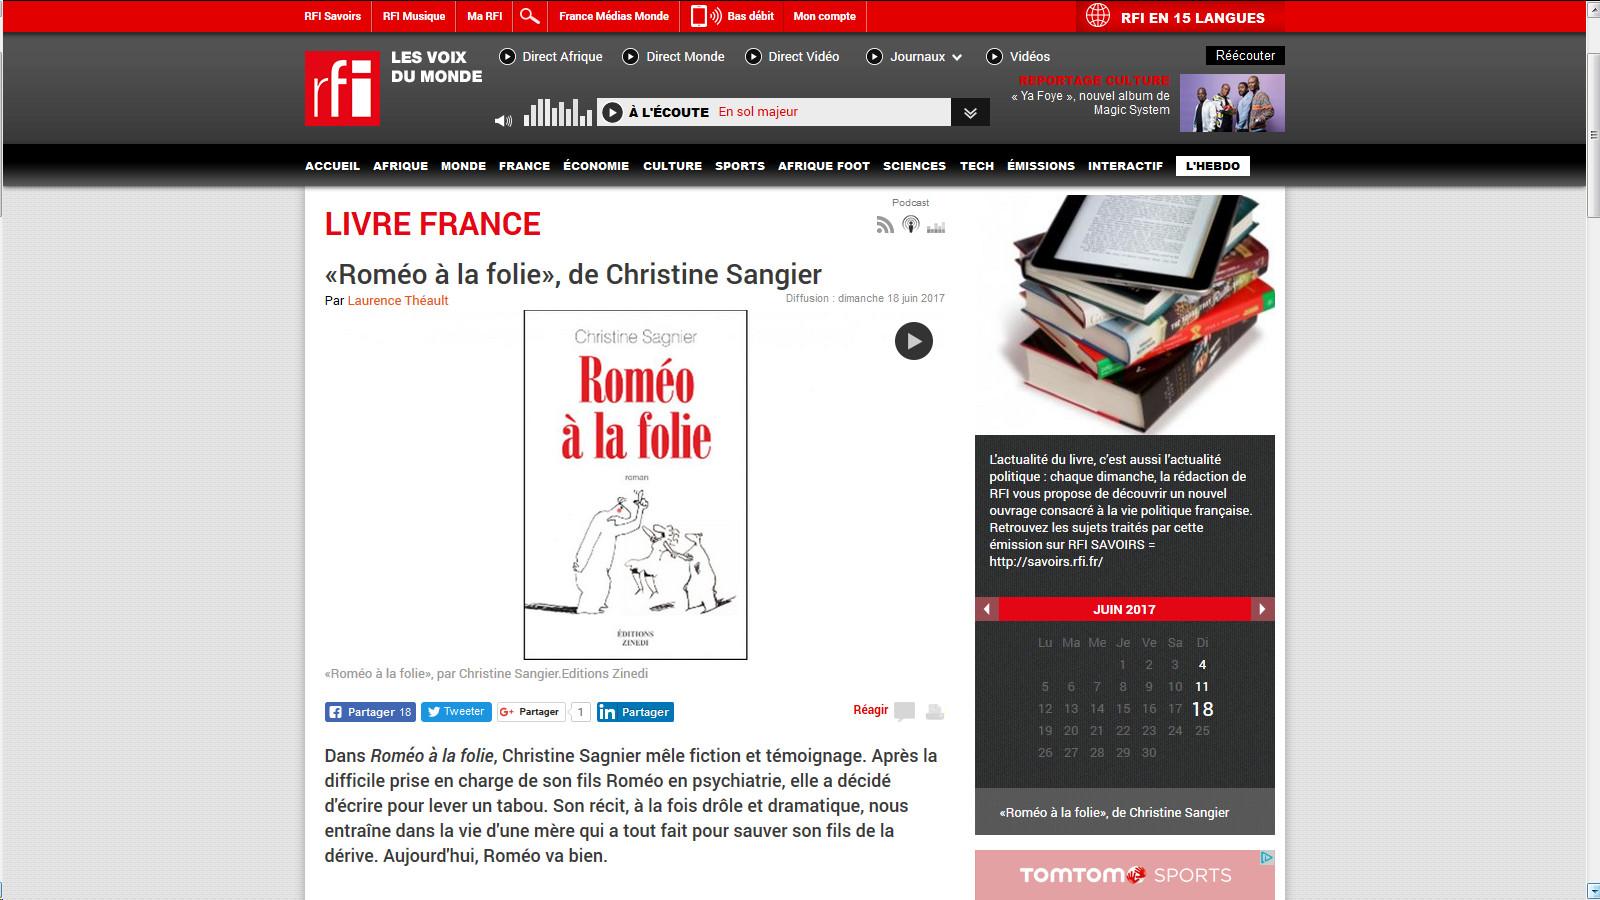 170618 rfi livre france